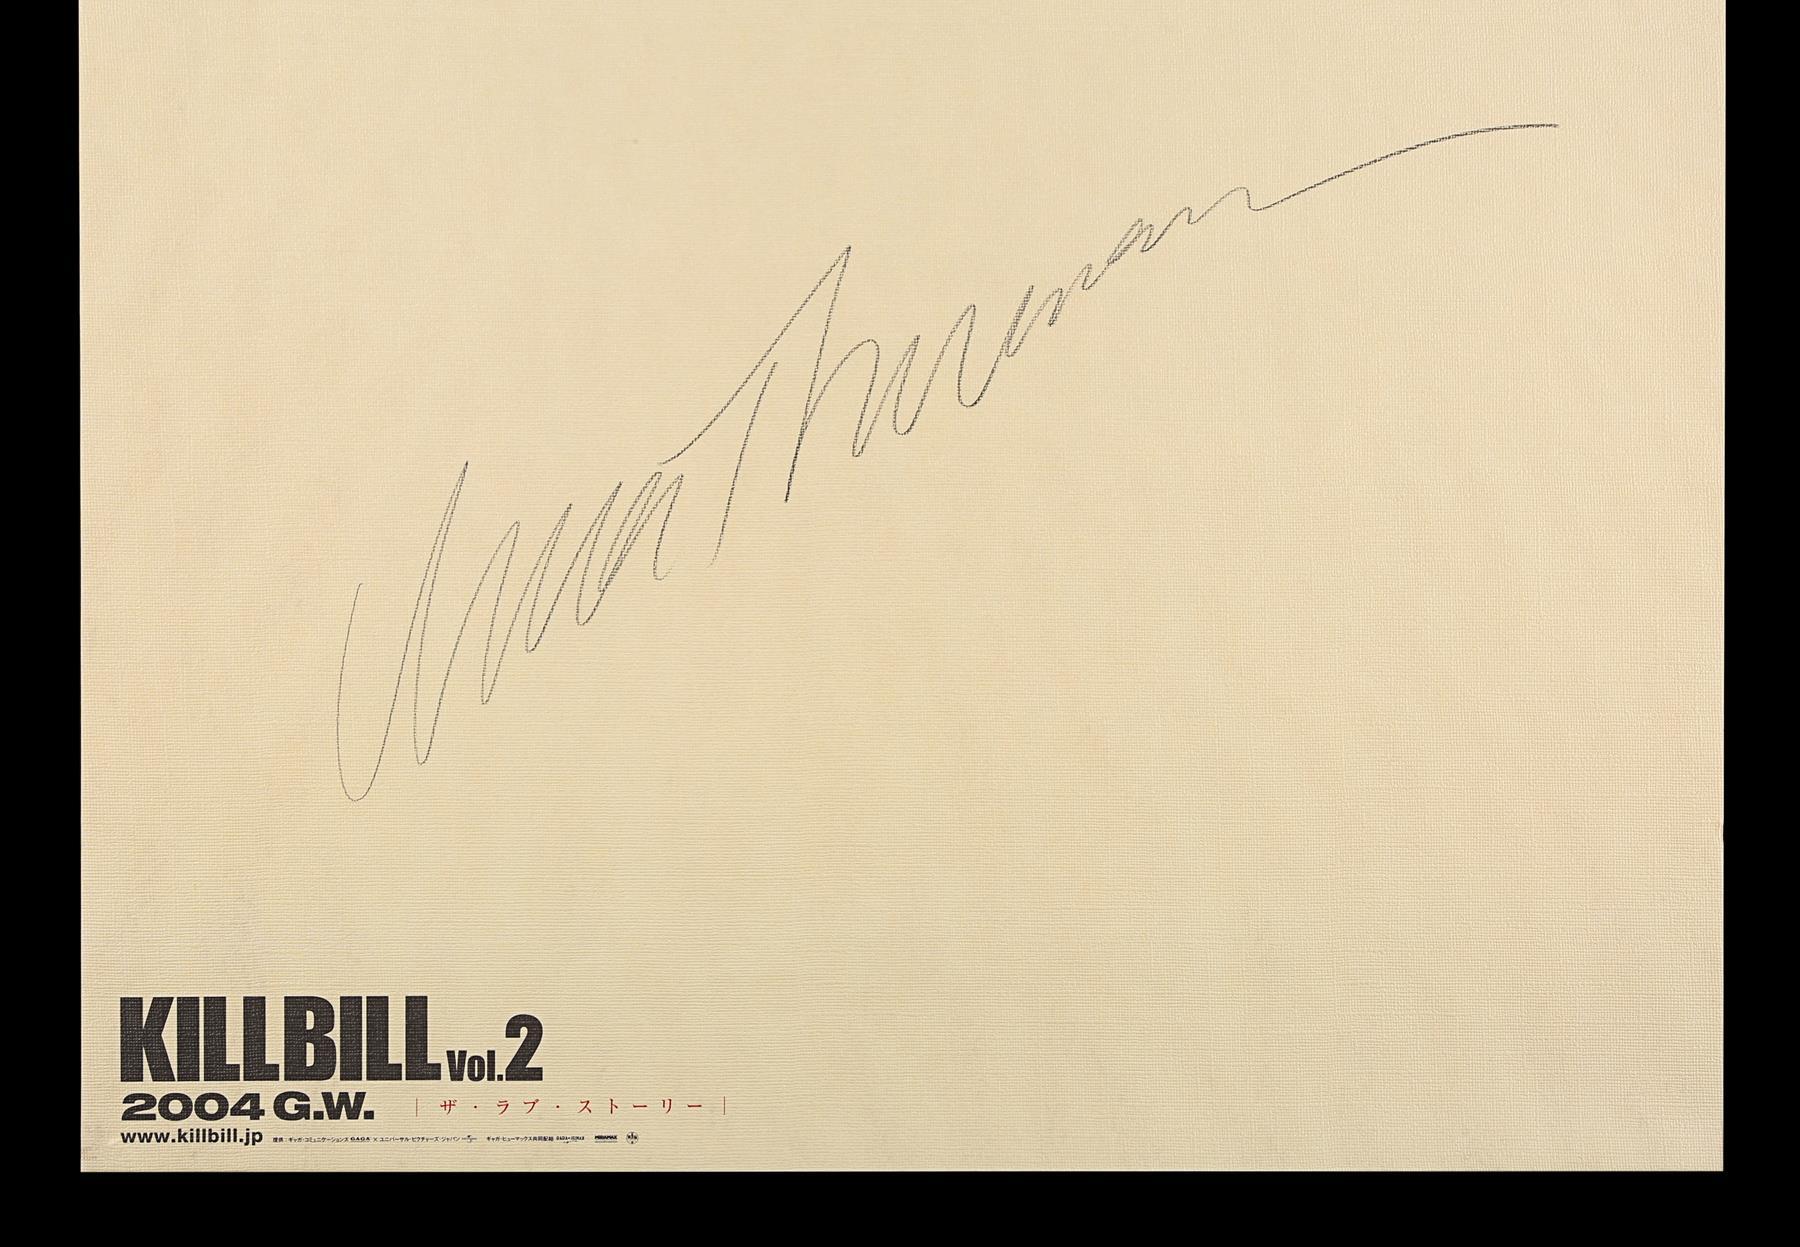 KILL BILL: VOLUME II (2004) - Japanese B1, 2004, Autographed by Uma Thurman - Image 3 of 5